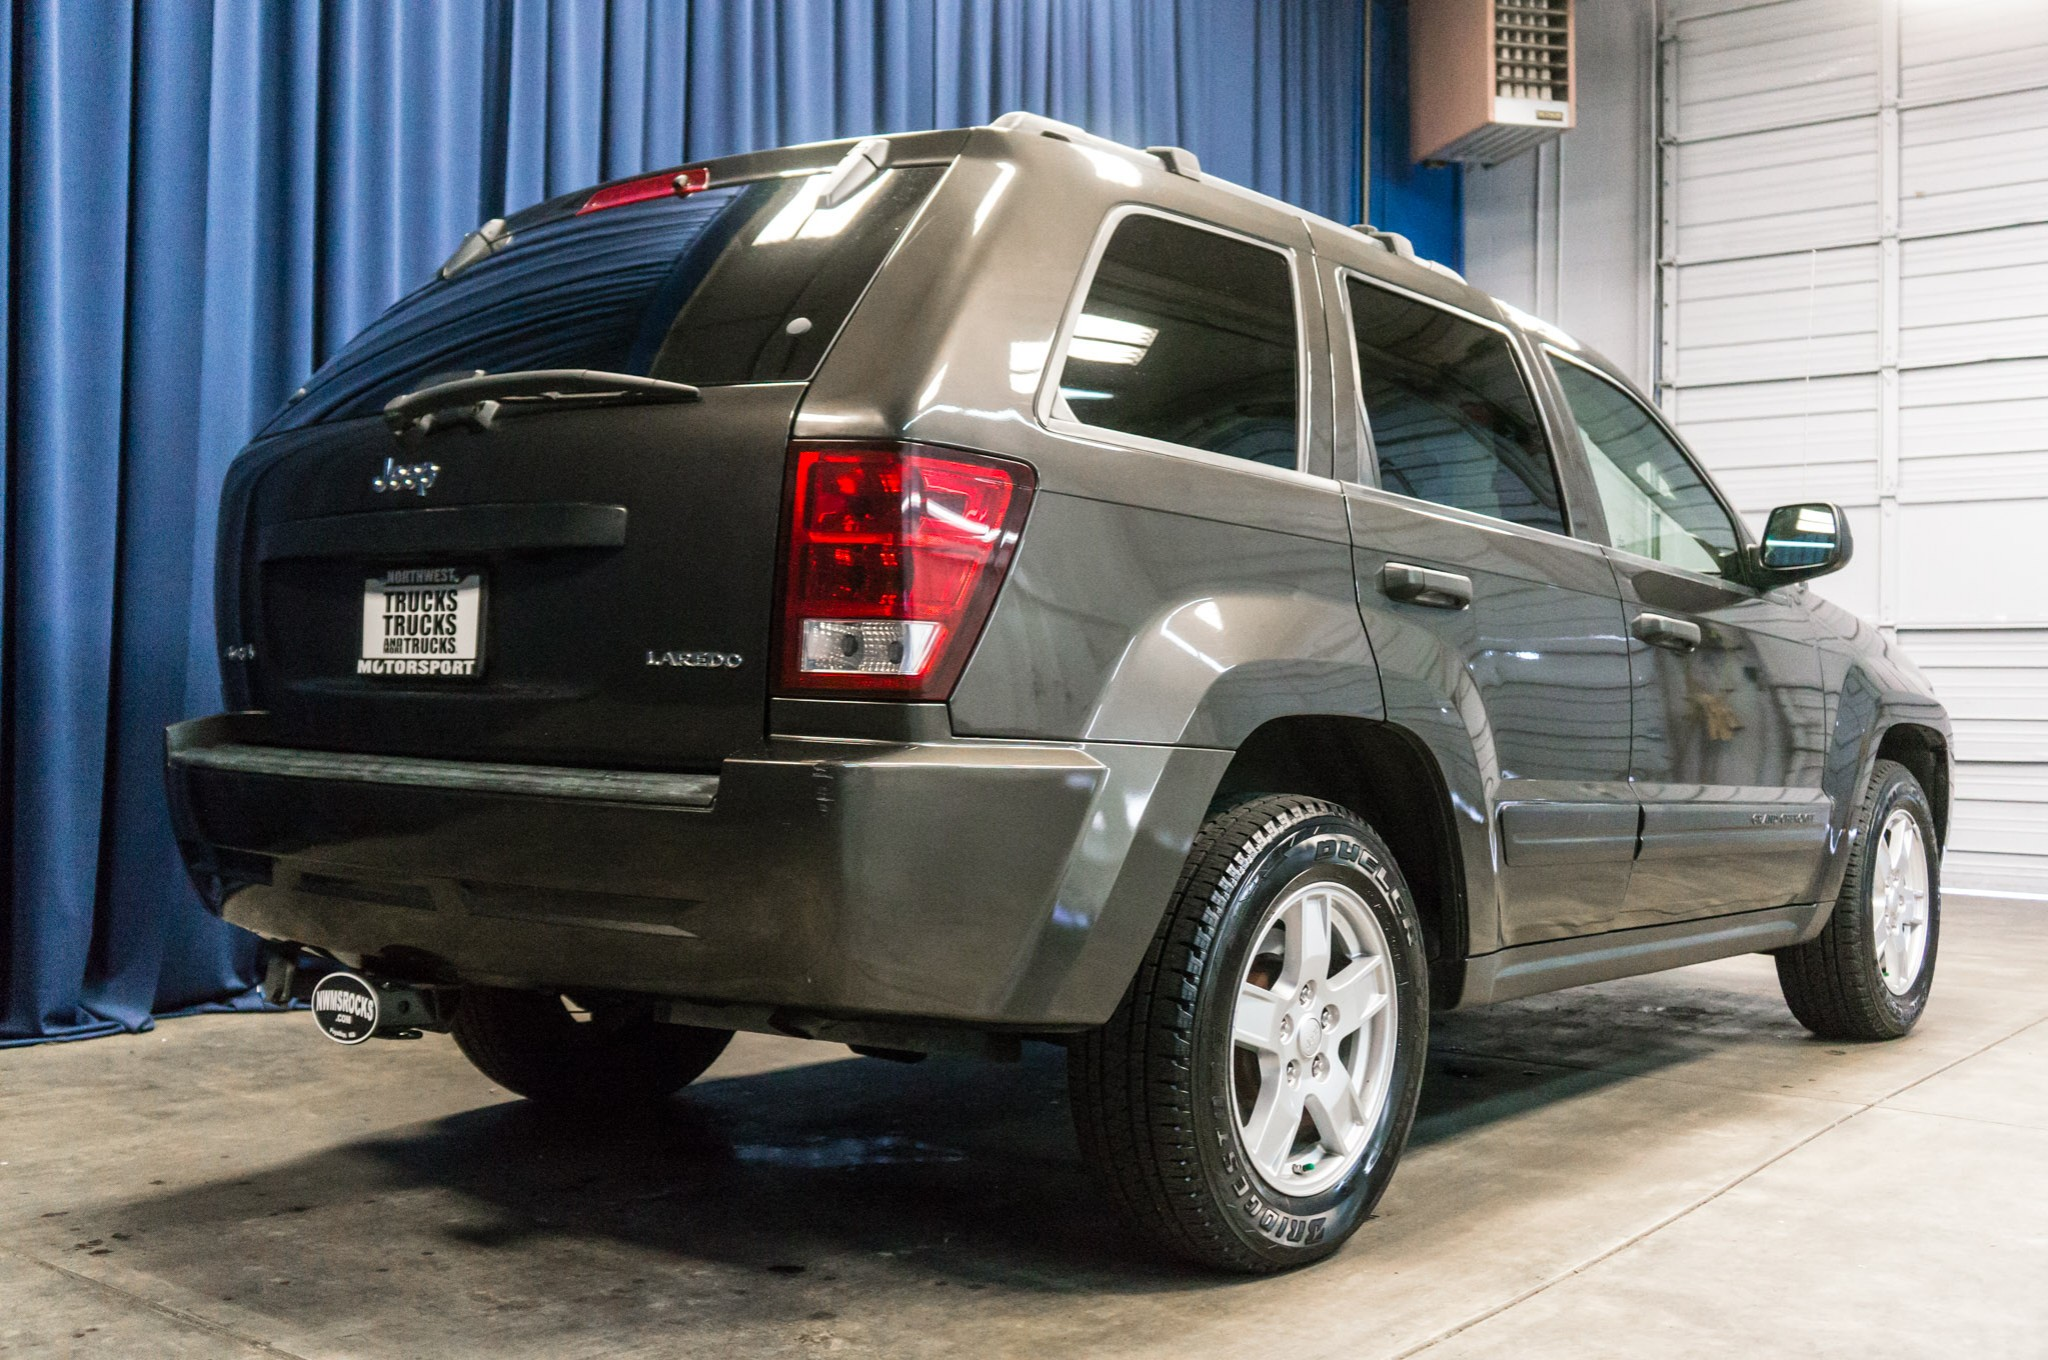 Used 2005 jeep grand cherokee laredo 4x4 suv for sale 40548a - Jeep grand cherokee laredo interior ...